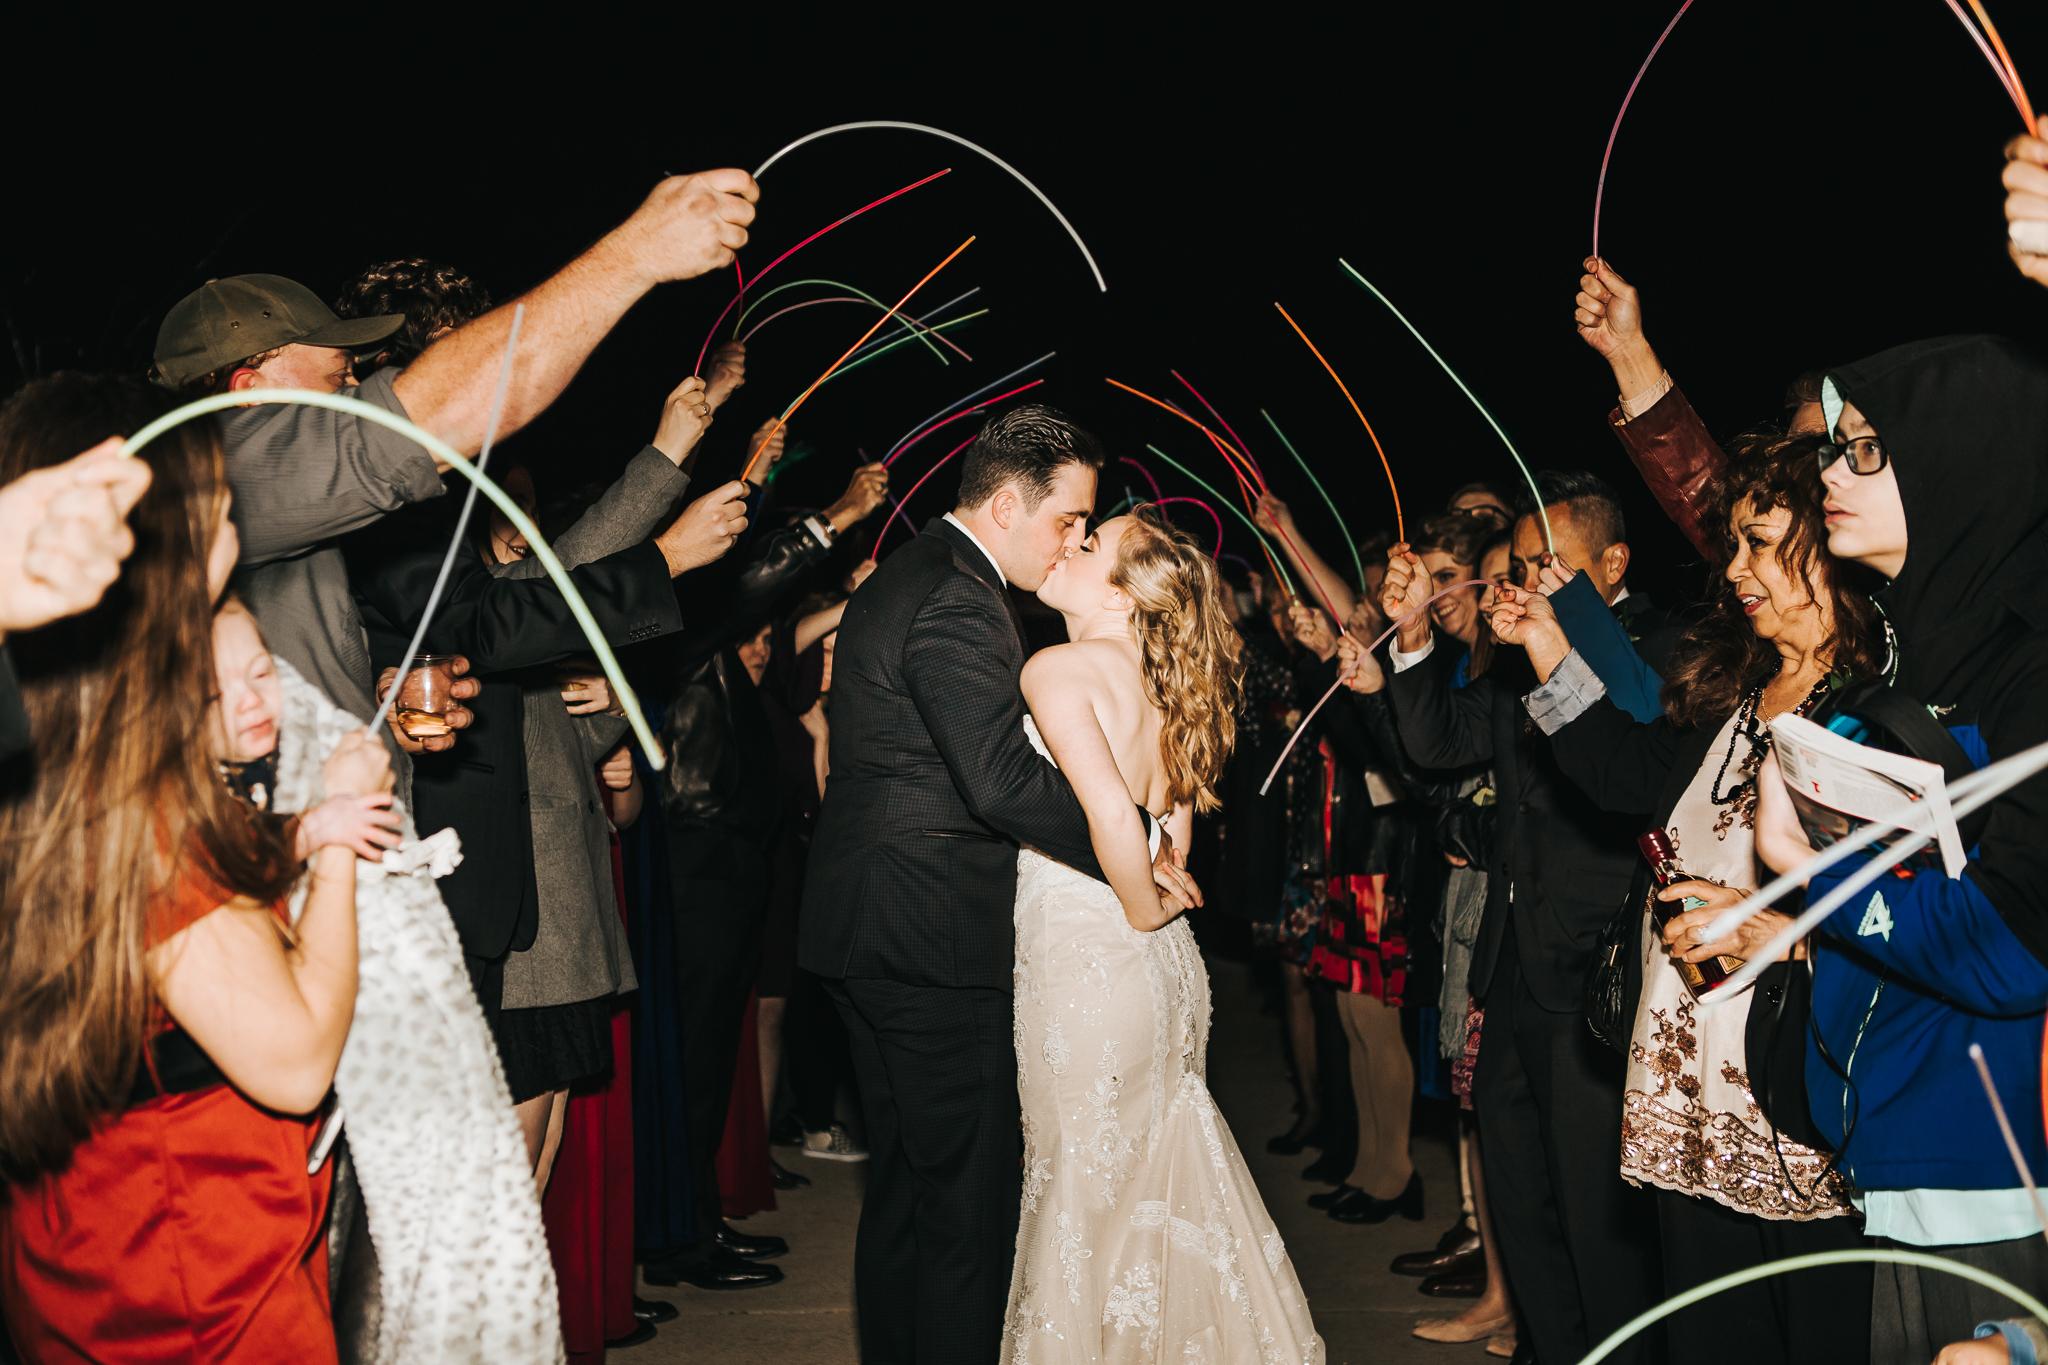 0189 Ariana Jordan Photo - Cameron & Lauren's Wedding at Talon Winery  0014.jpg